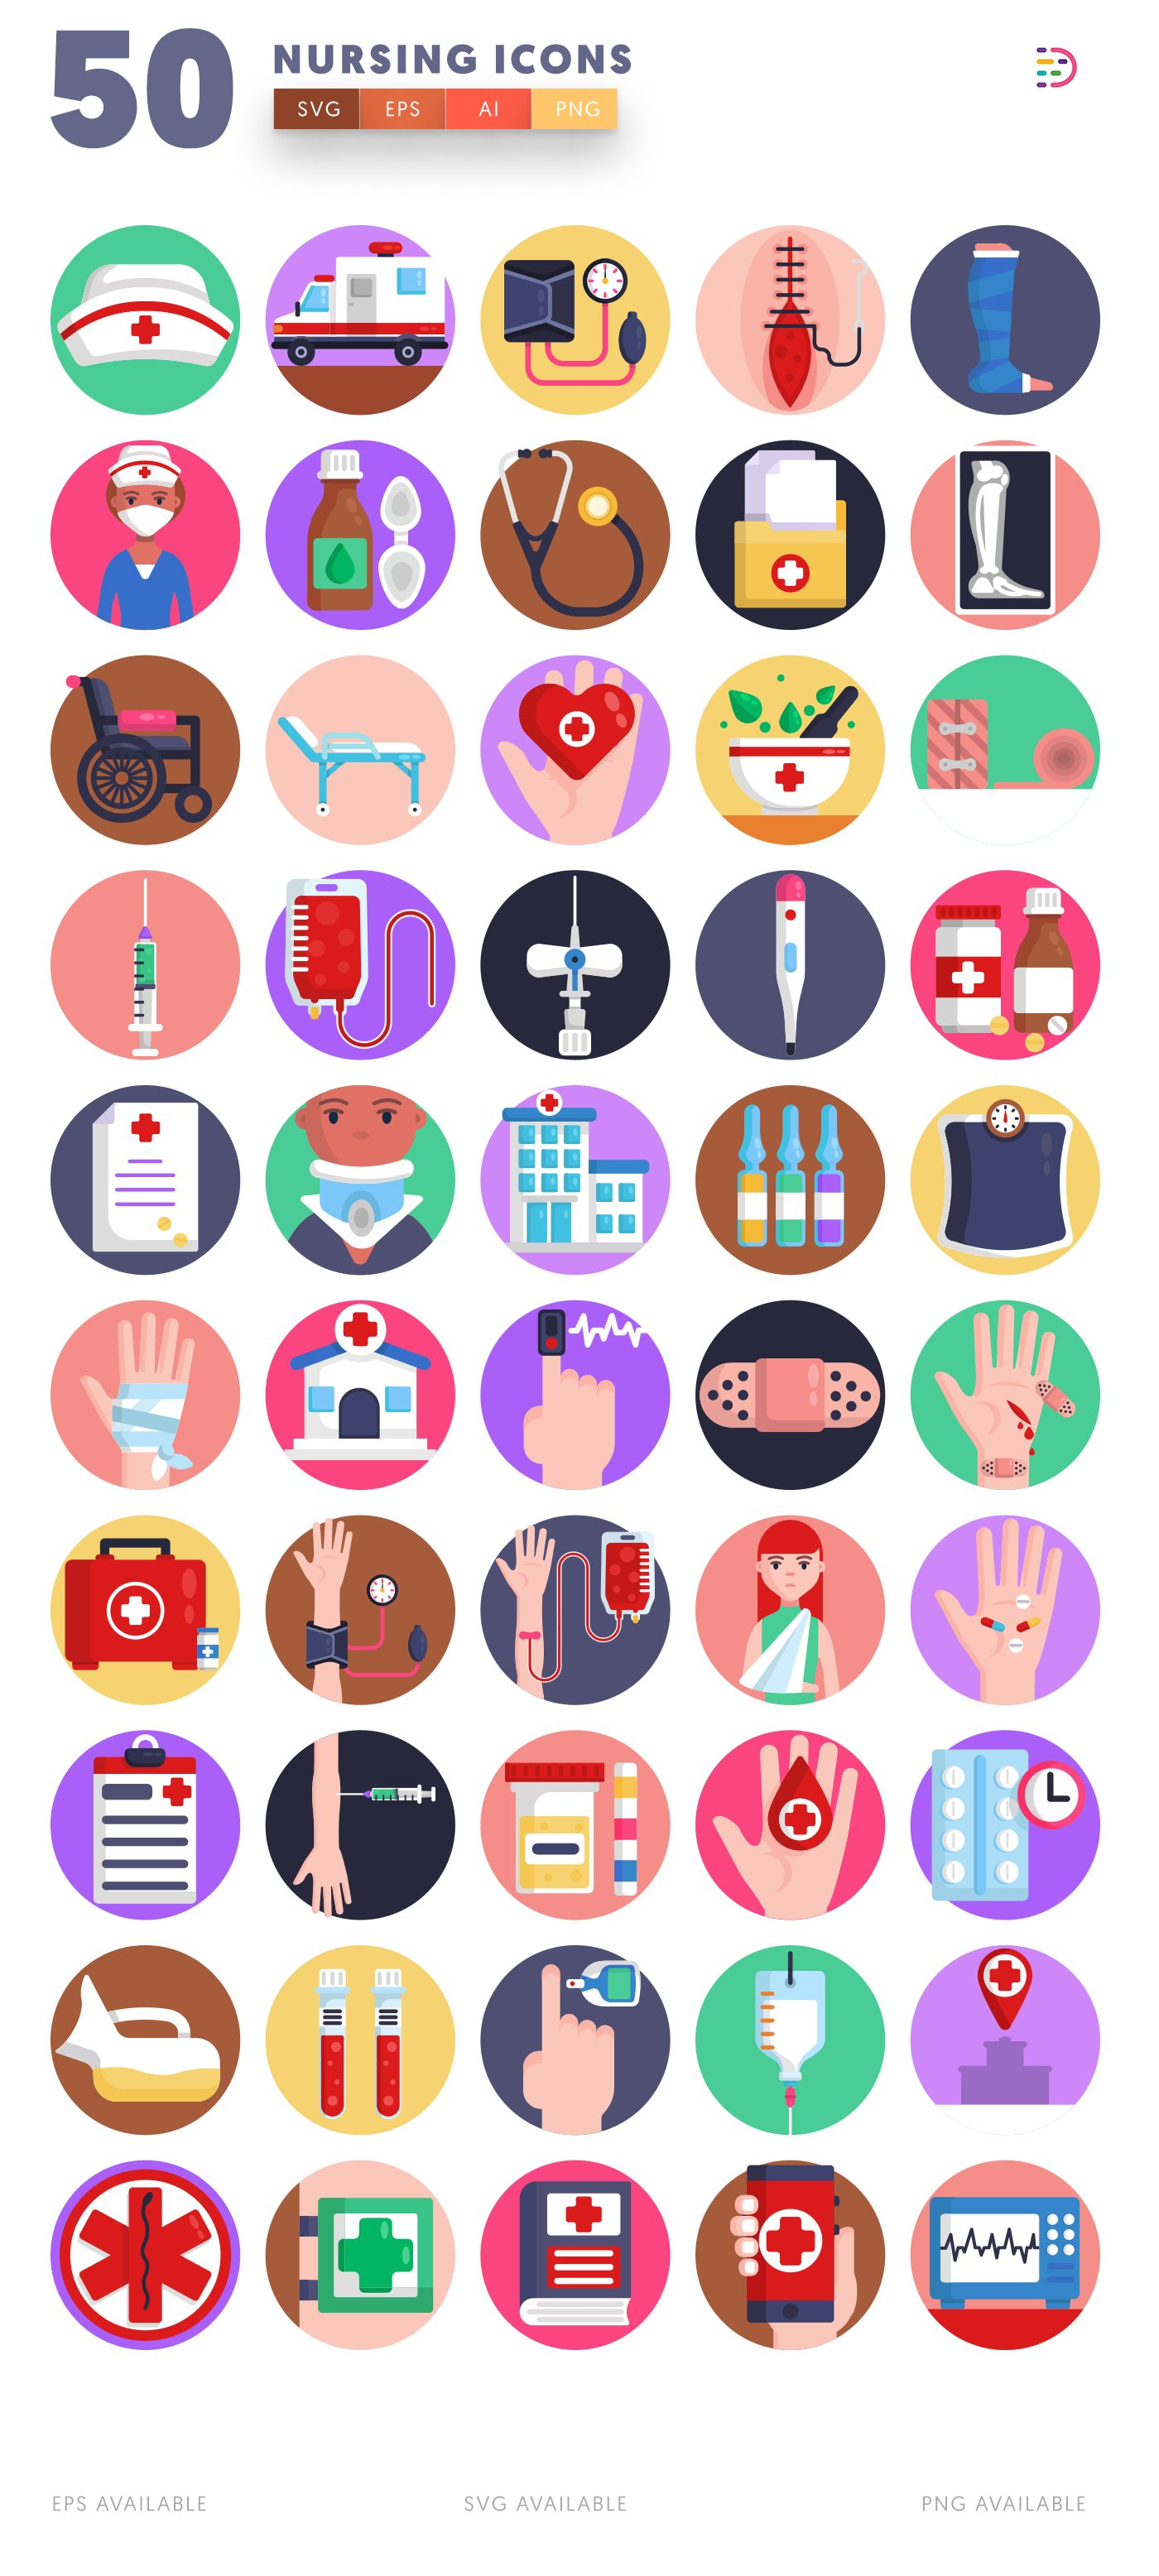 Nursing icon pack